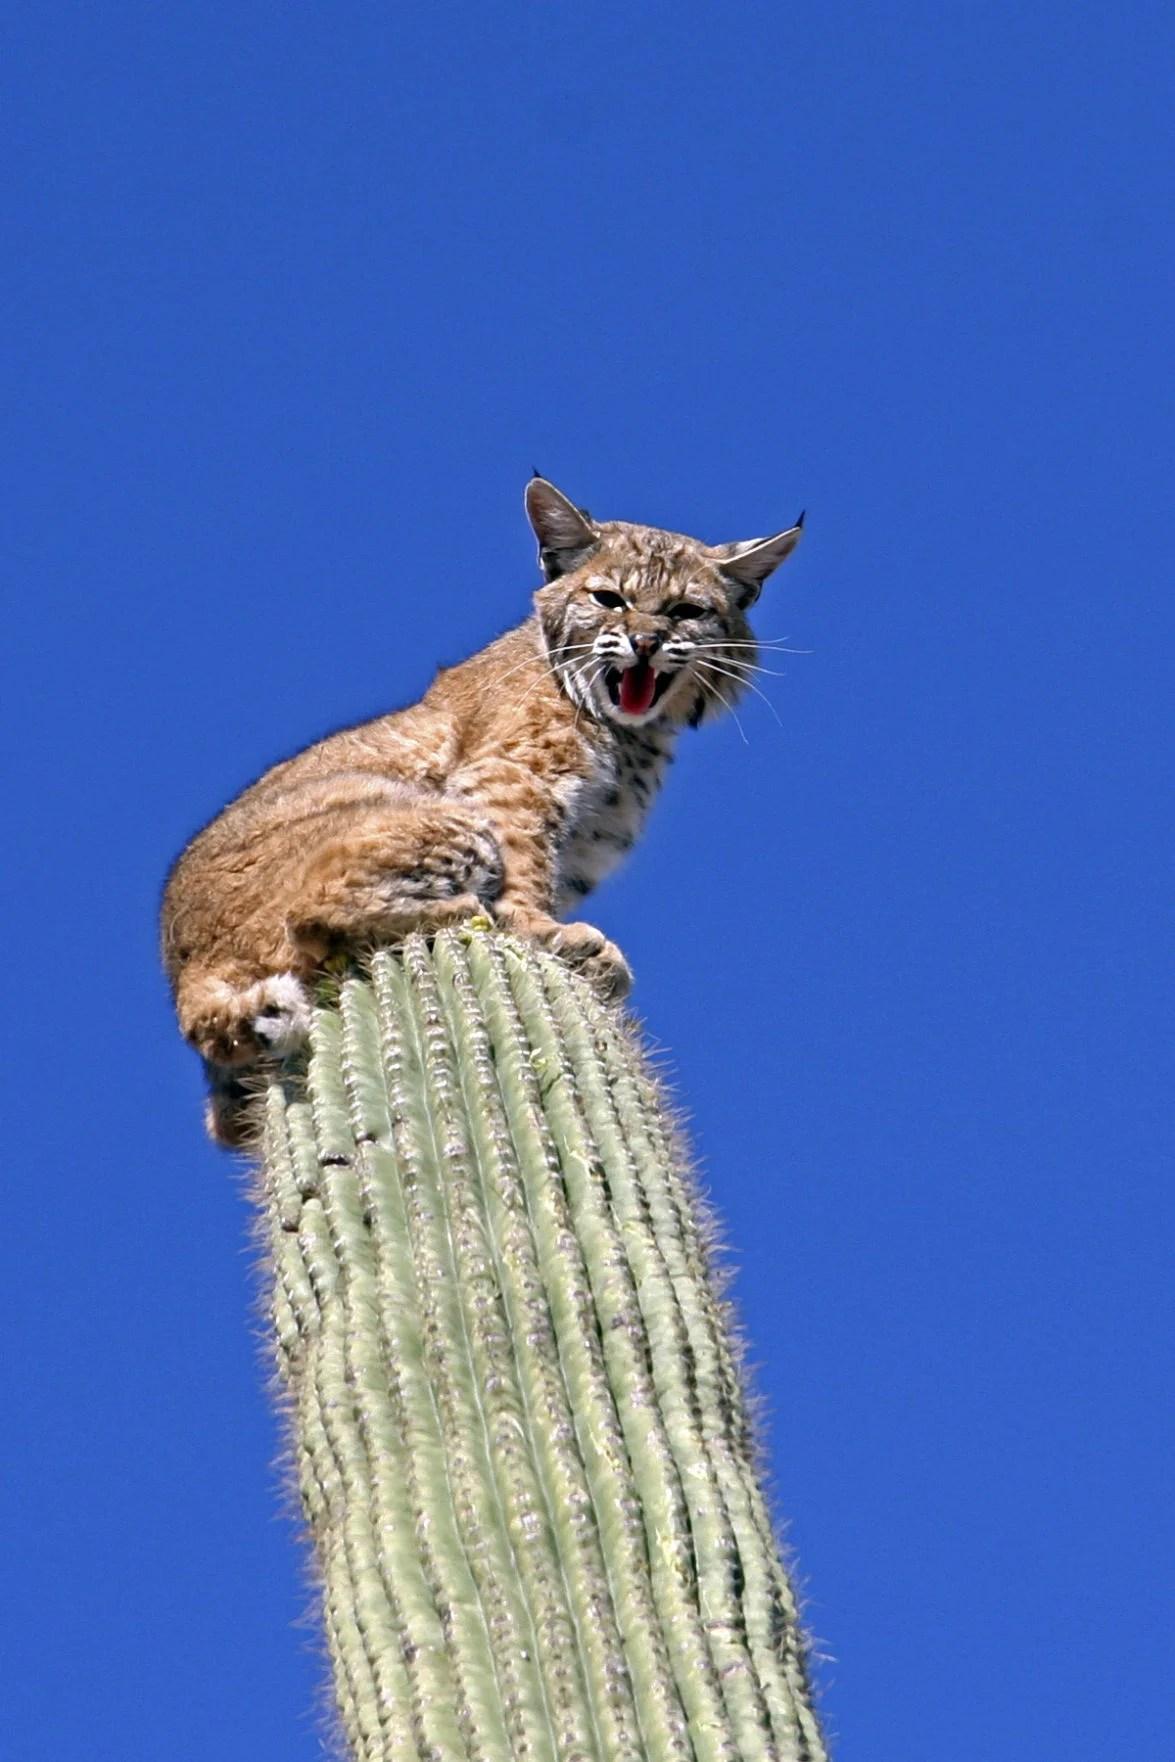 hanging indoor chair mid century barrel reader photos of southern arizona's backyard bobcats   contributed tucson.com